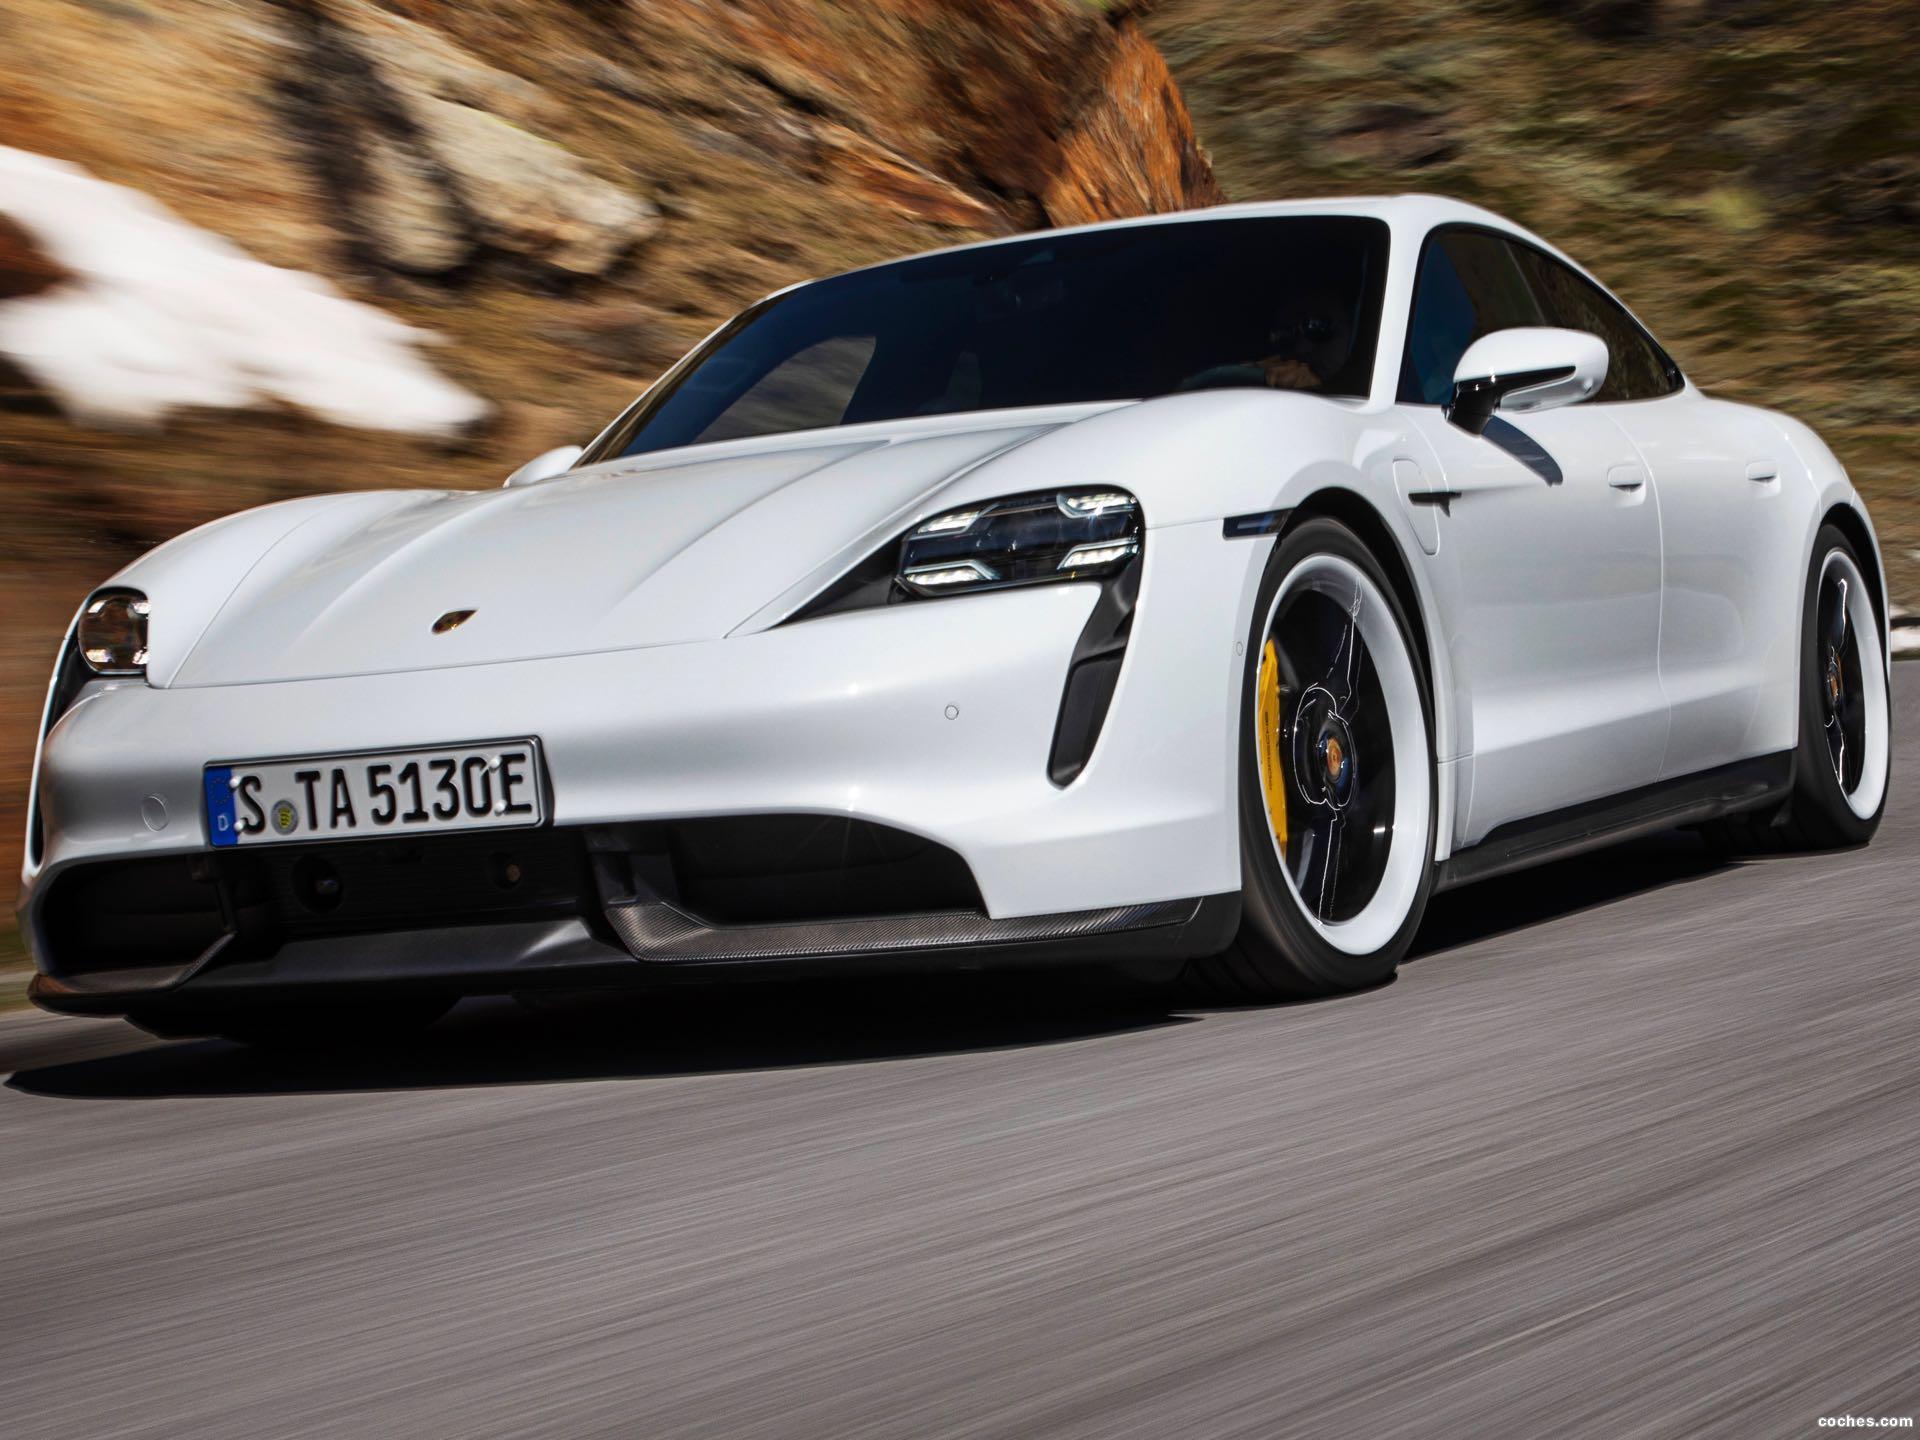 Foto 2 de Porsche Taycan Turbo S 2019